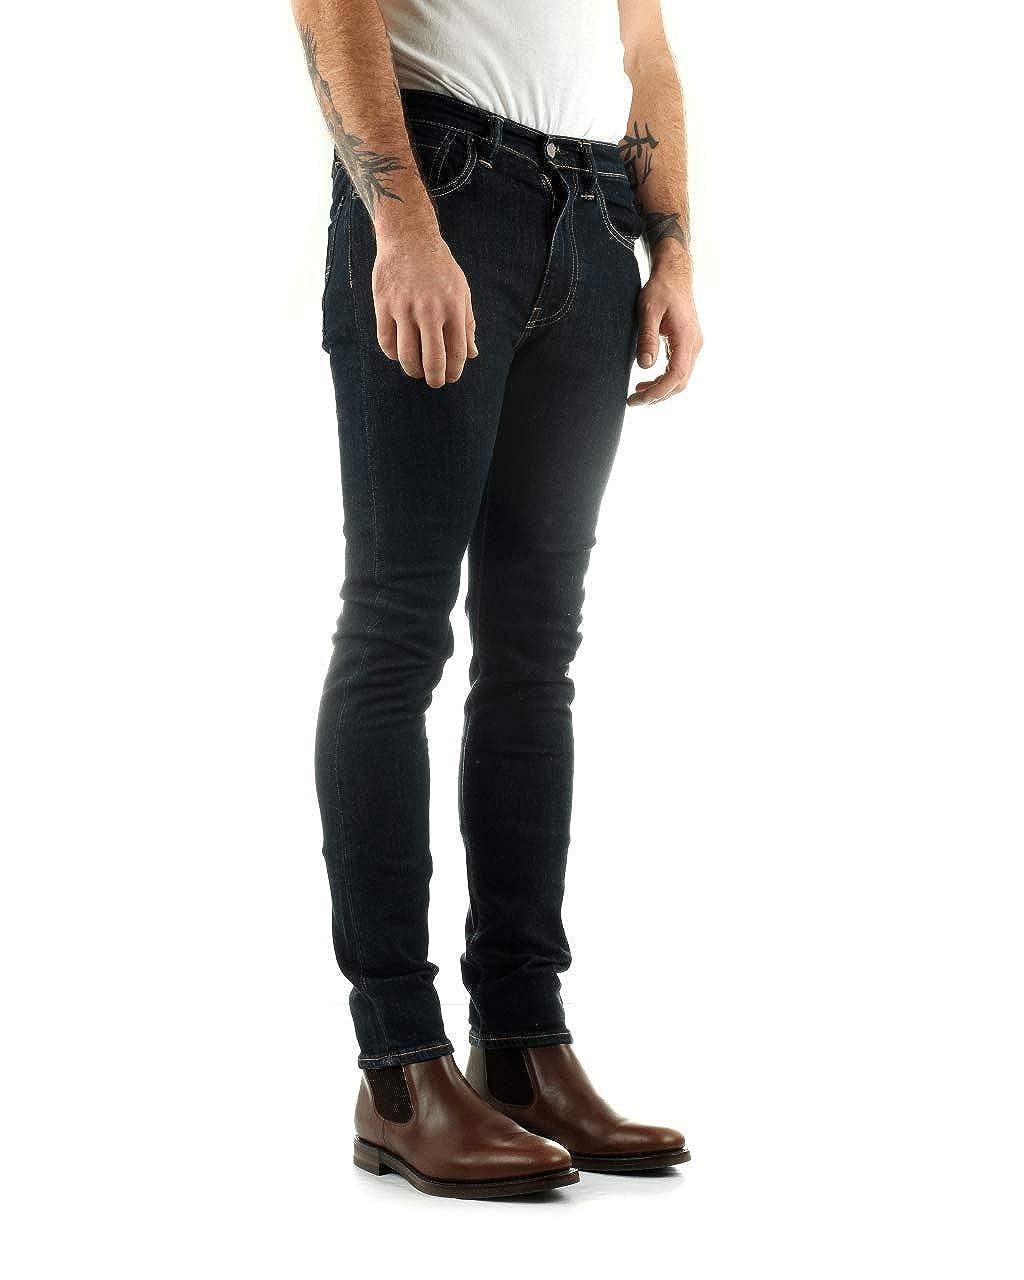 TALLA 38W / 34L. Pantalon Vaquero Levis 519 Skinny